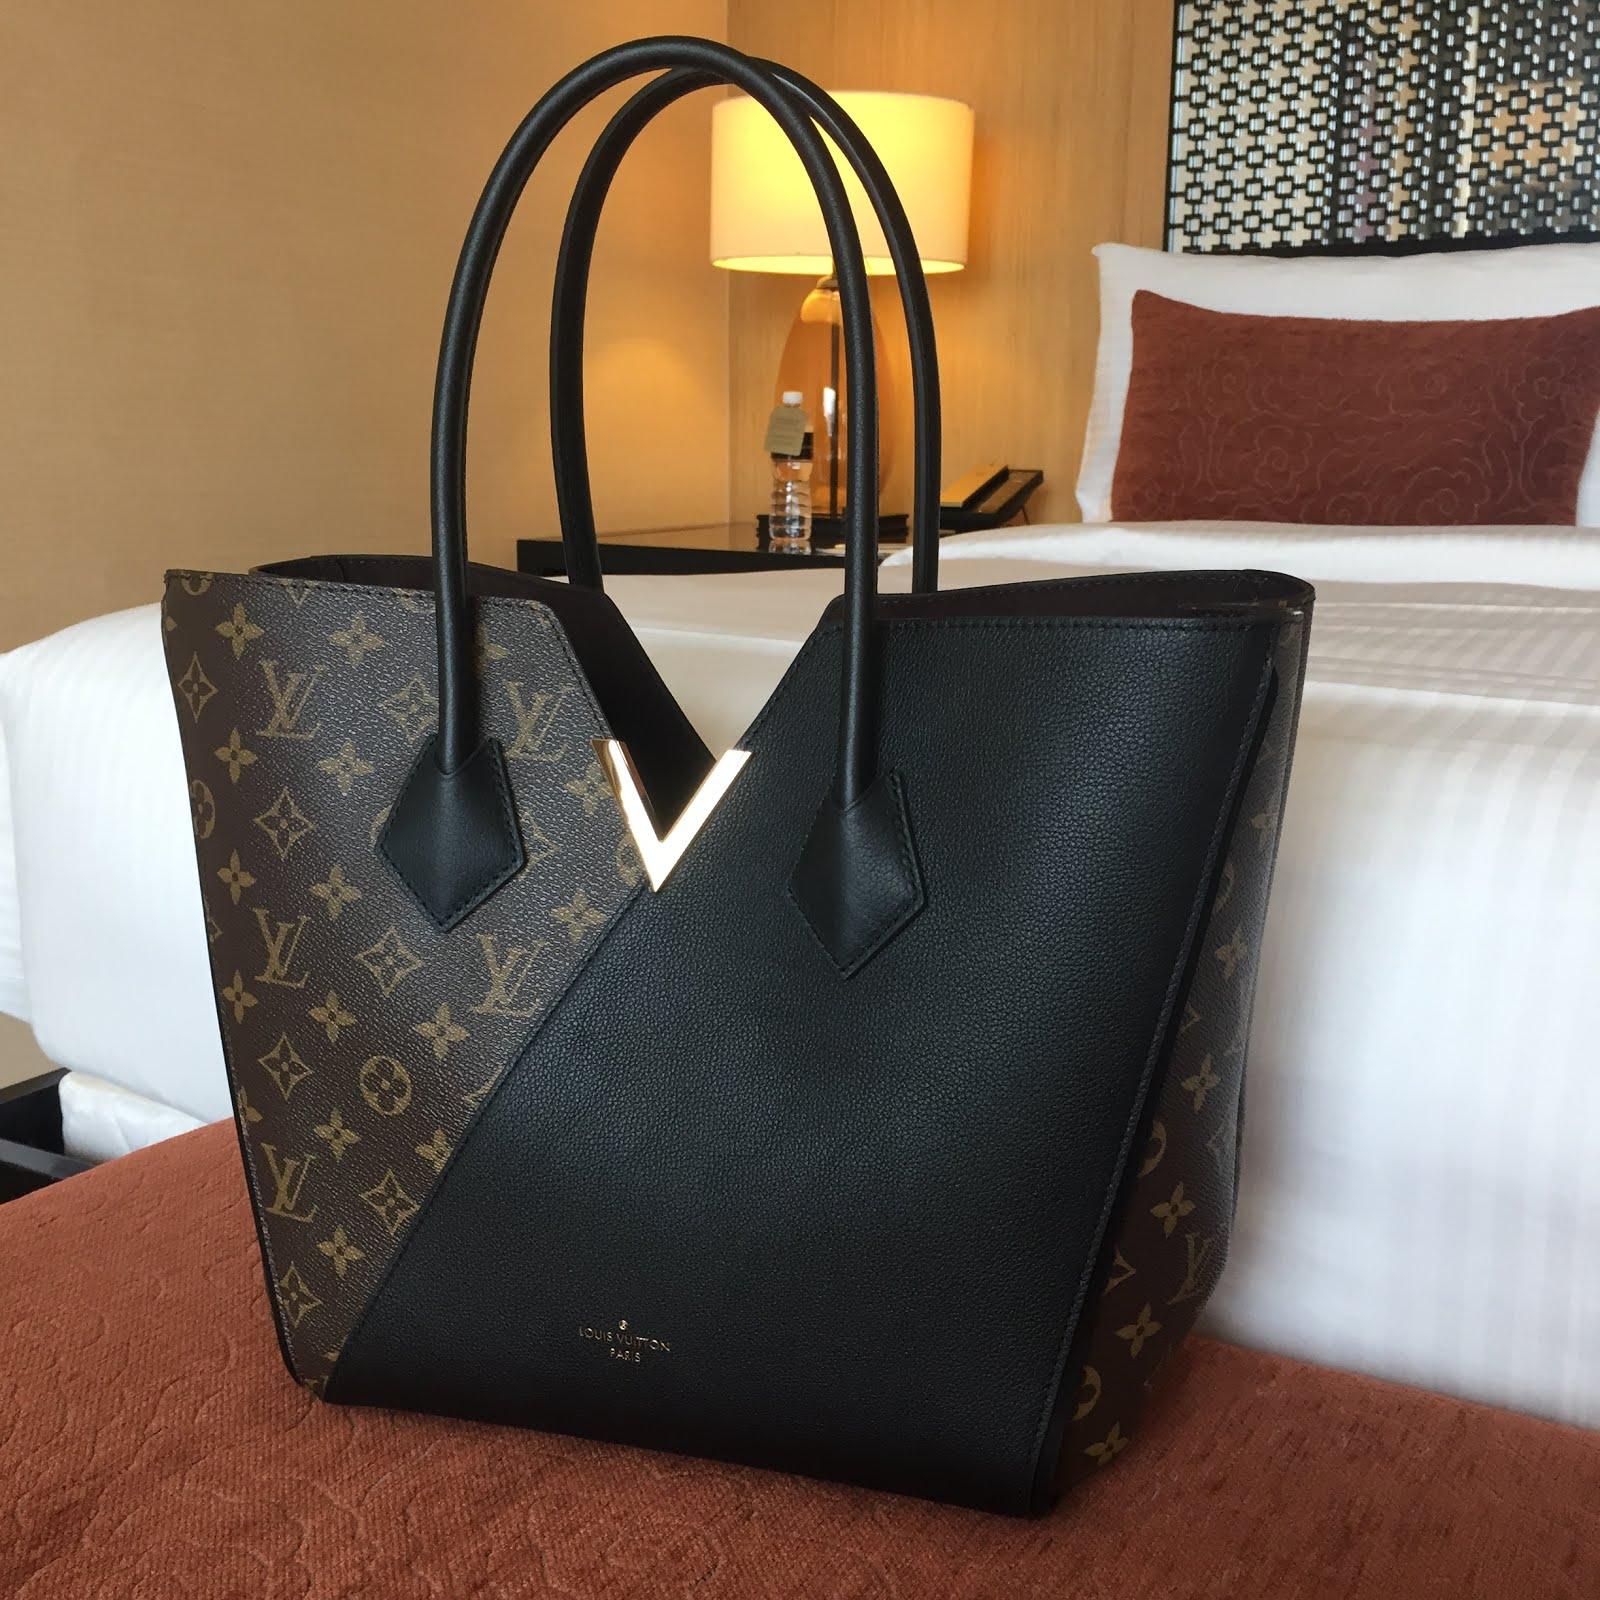 Louis Vuitton Kimono Bag Review